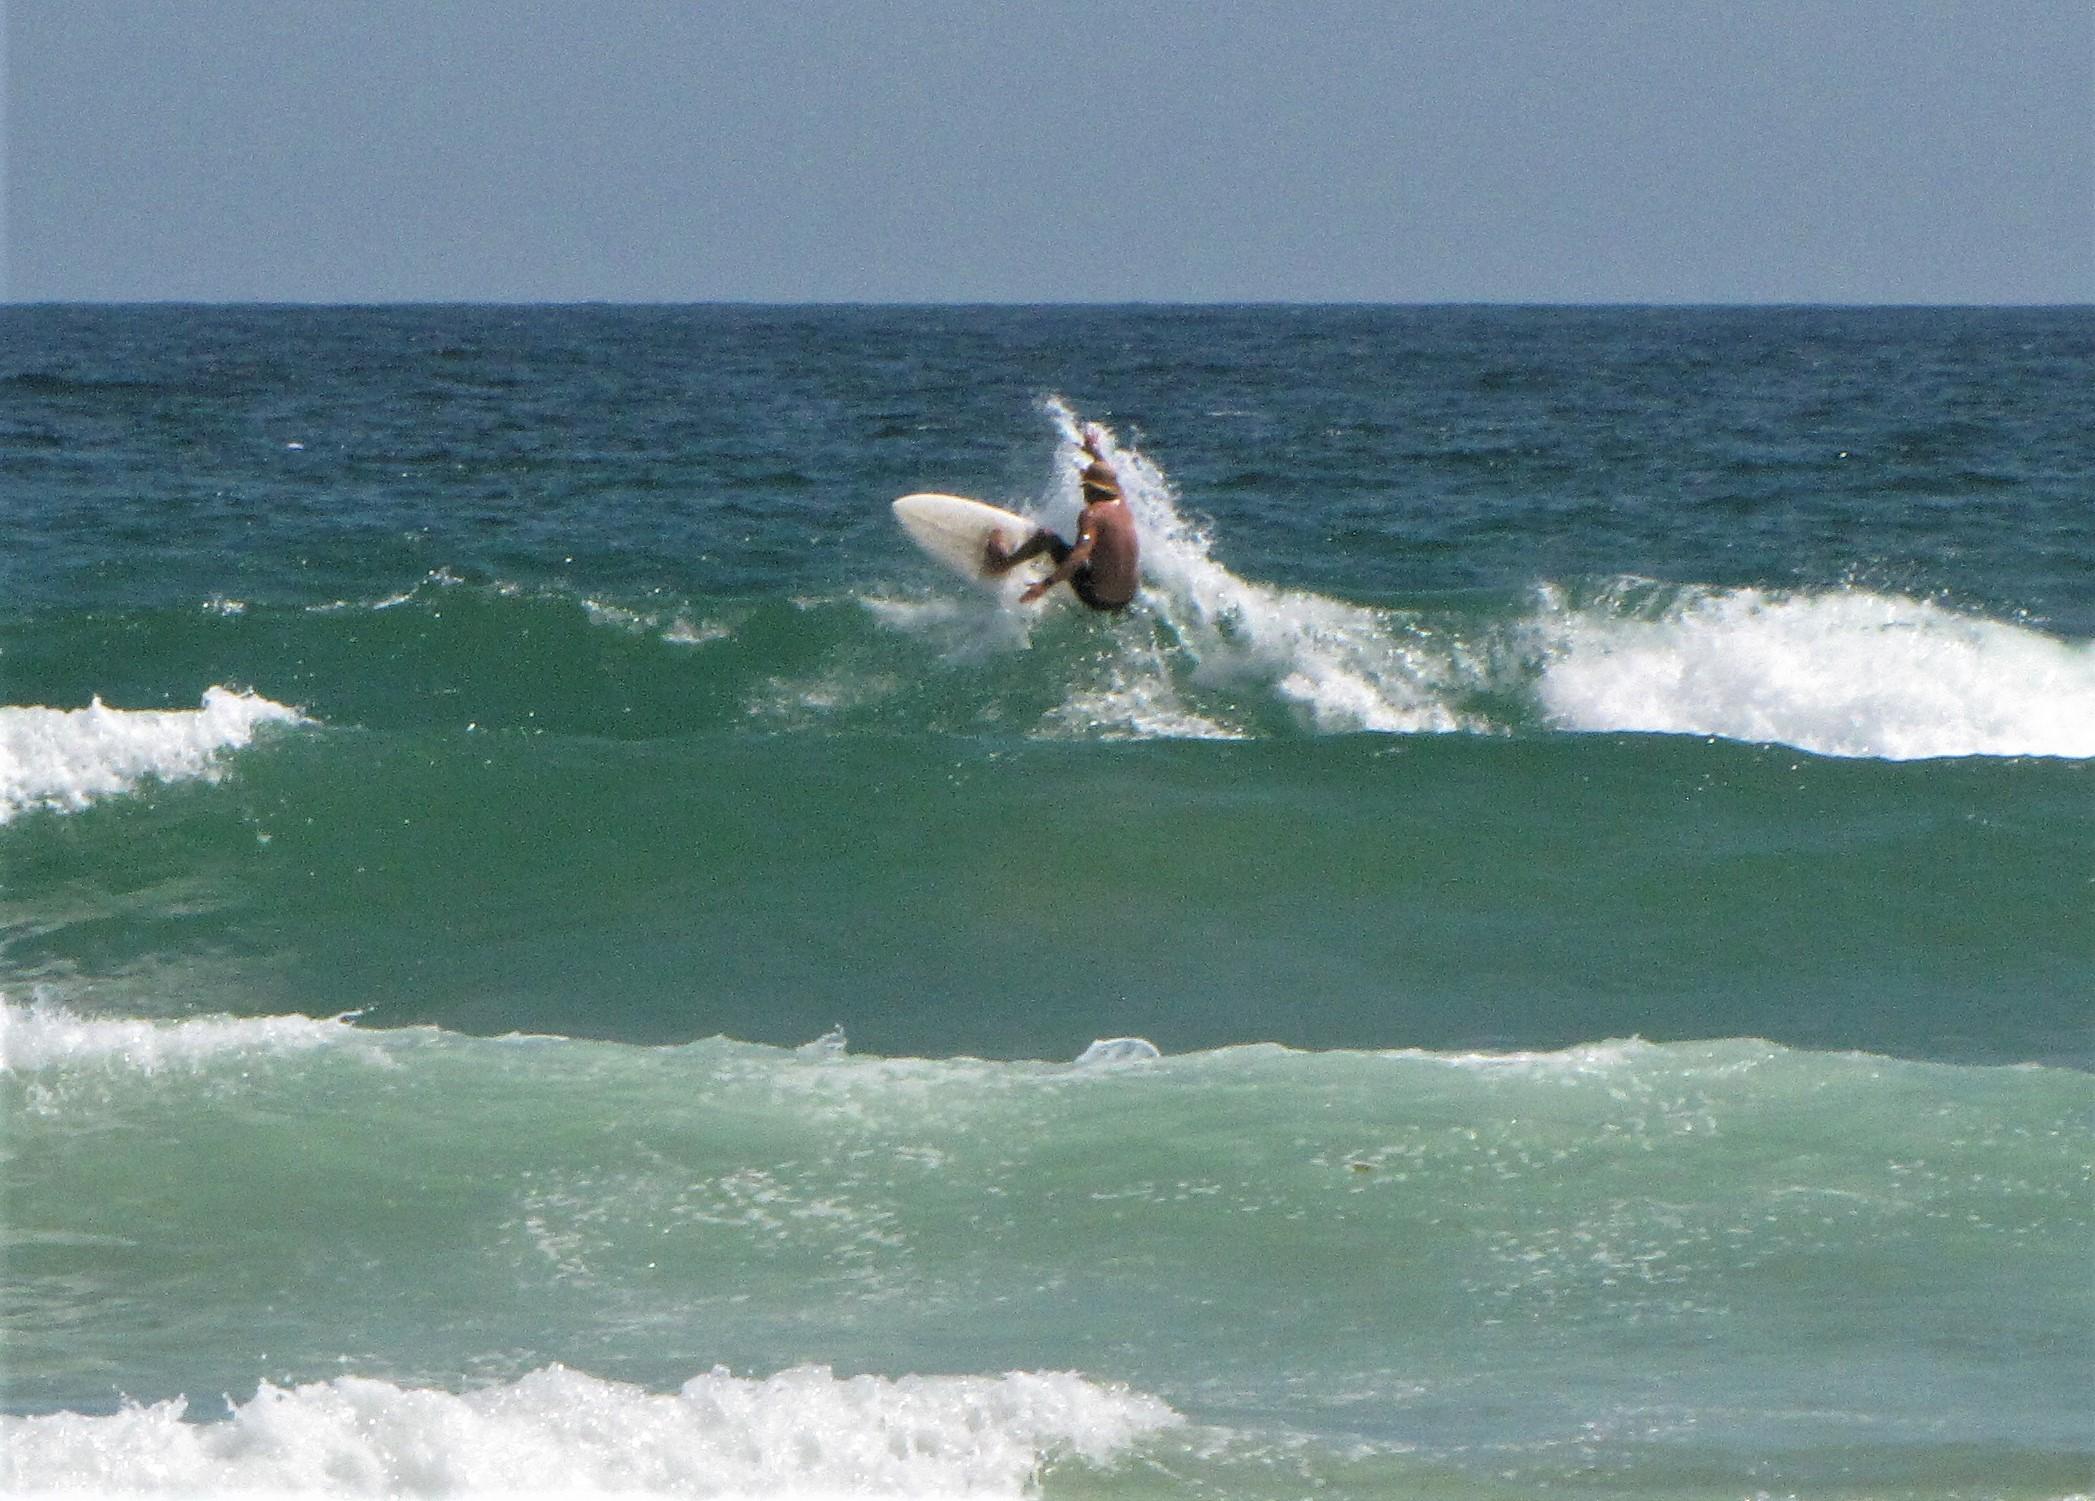 meia praia surf good turn